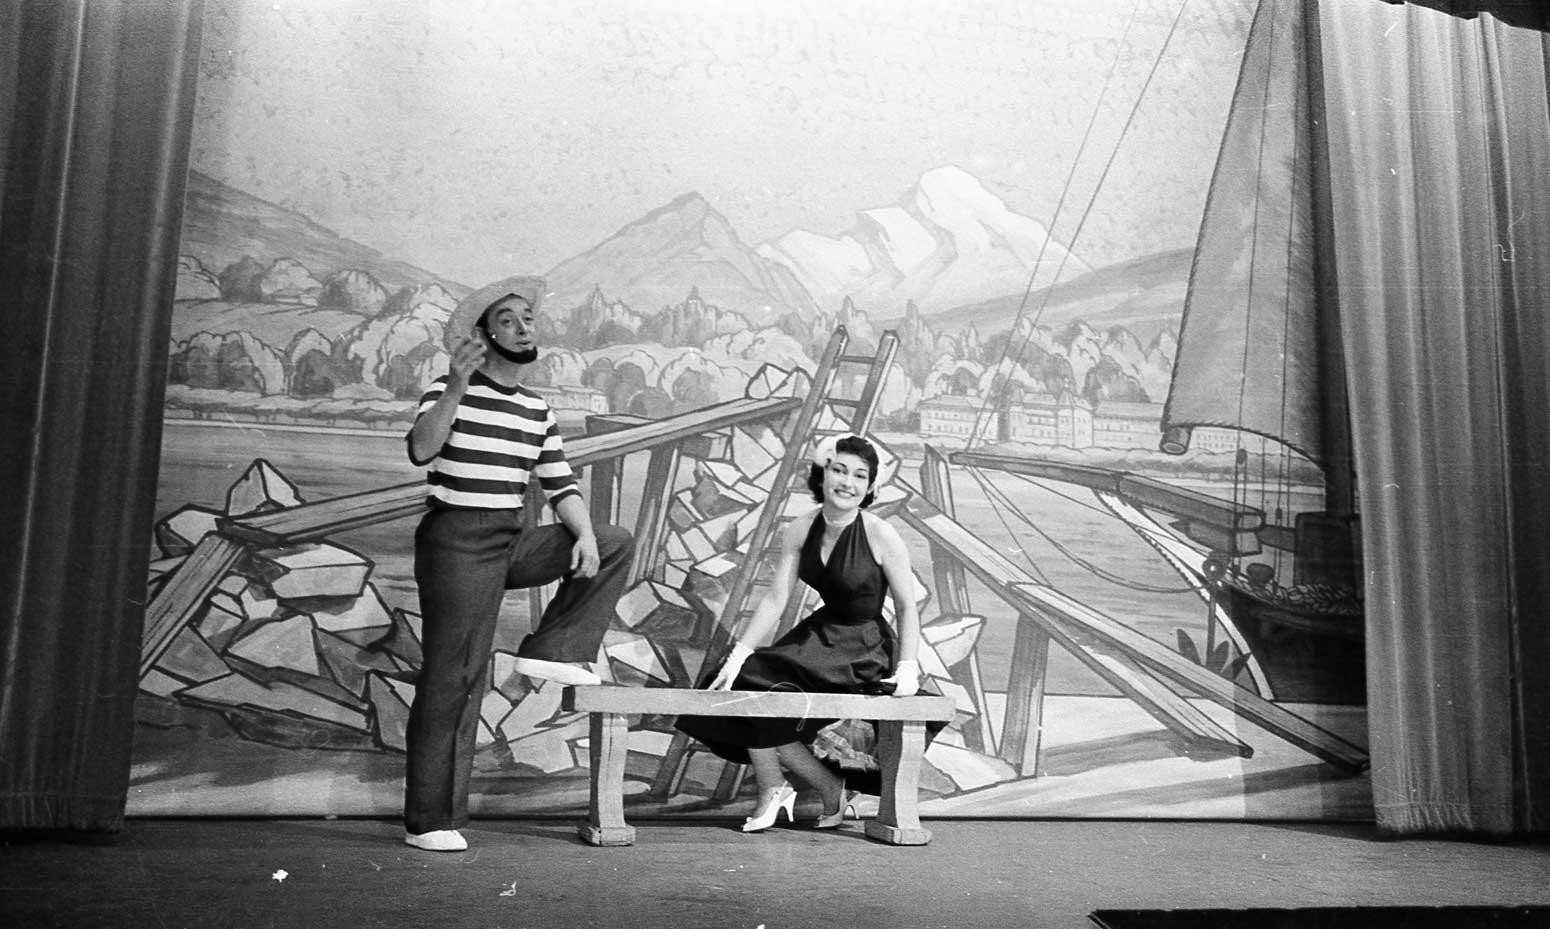 Revue 1958 ©Centre d'iconographie genevoise